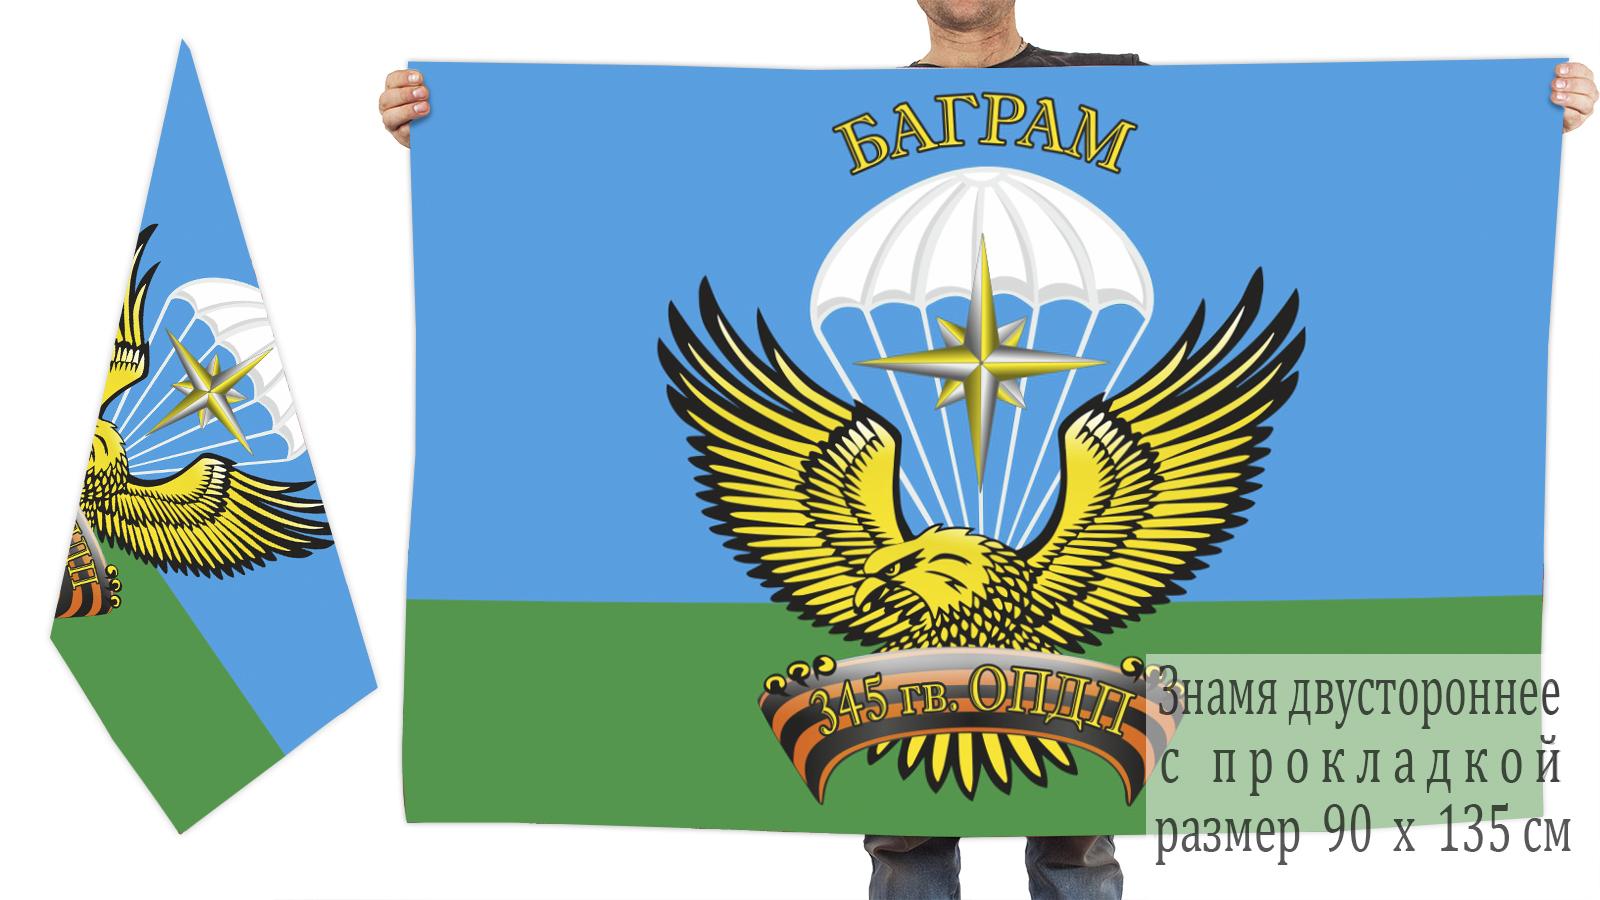 Двусторонний флаг ВДВ 345 гв. ОПДП заказать по лучшей цене